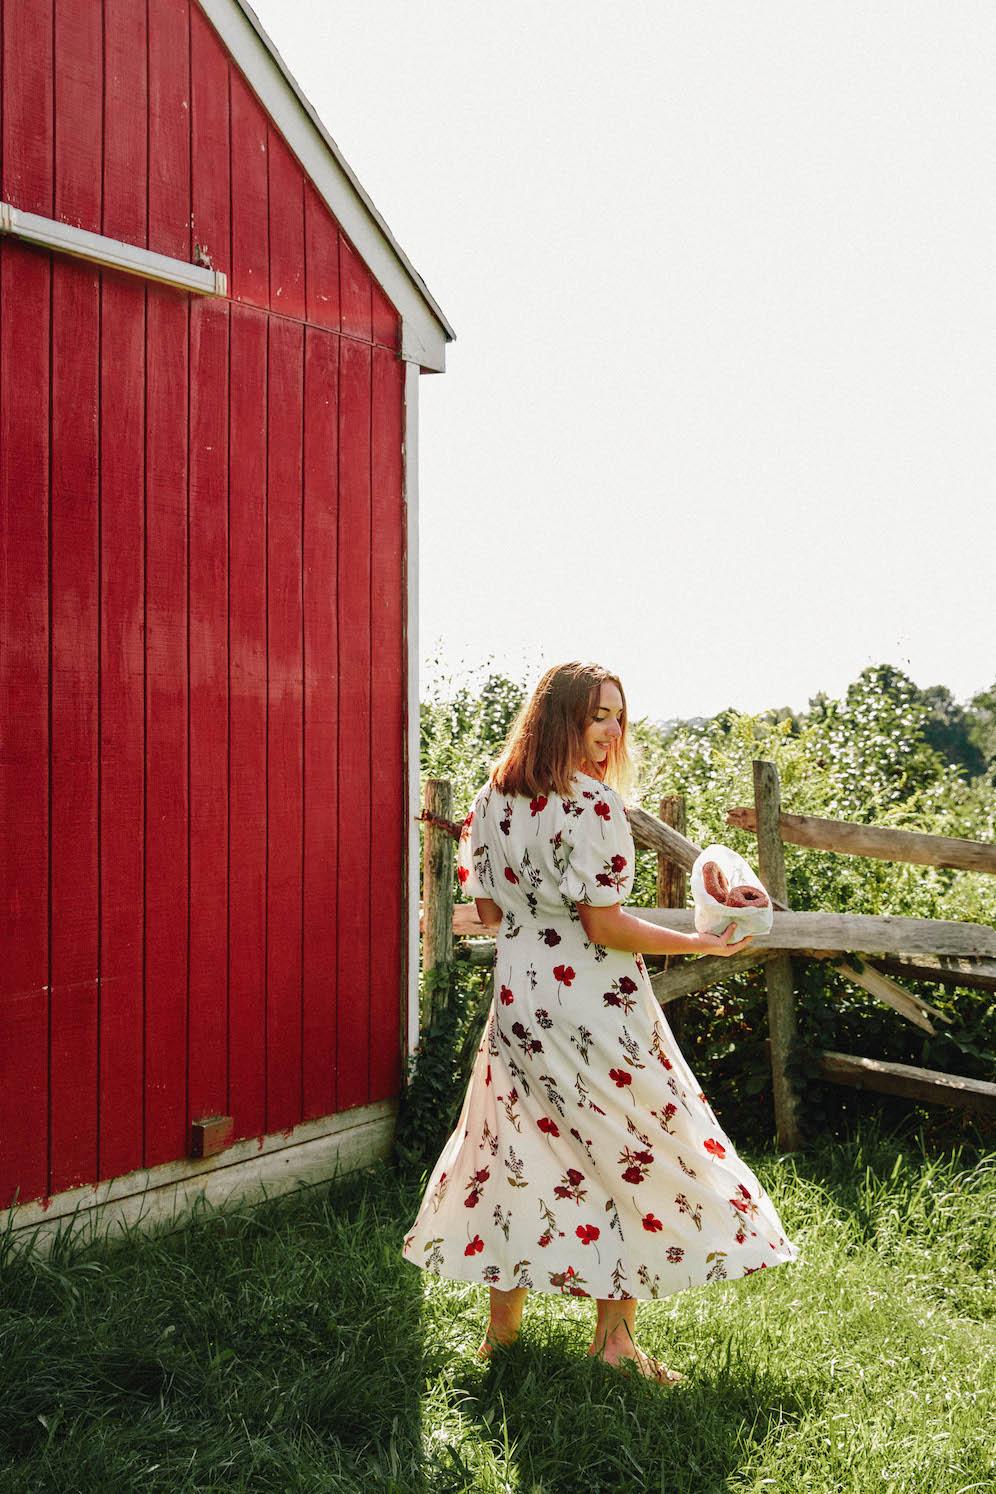 Cider-Mill-in-Fairfield-County-Connecticut-The-Coastal-Confidence-by-Aubrey-Yandow-0863.jpg